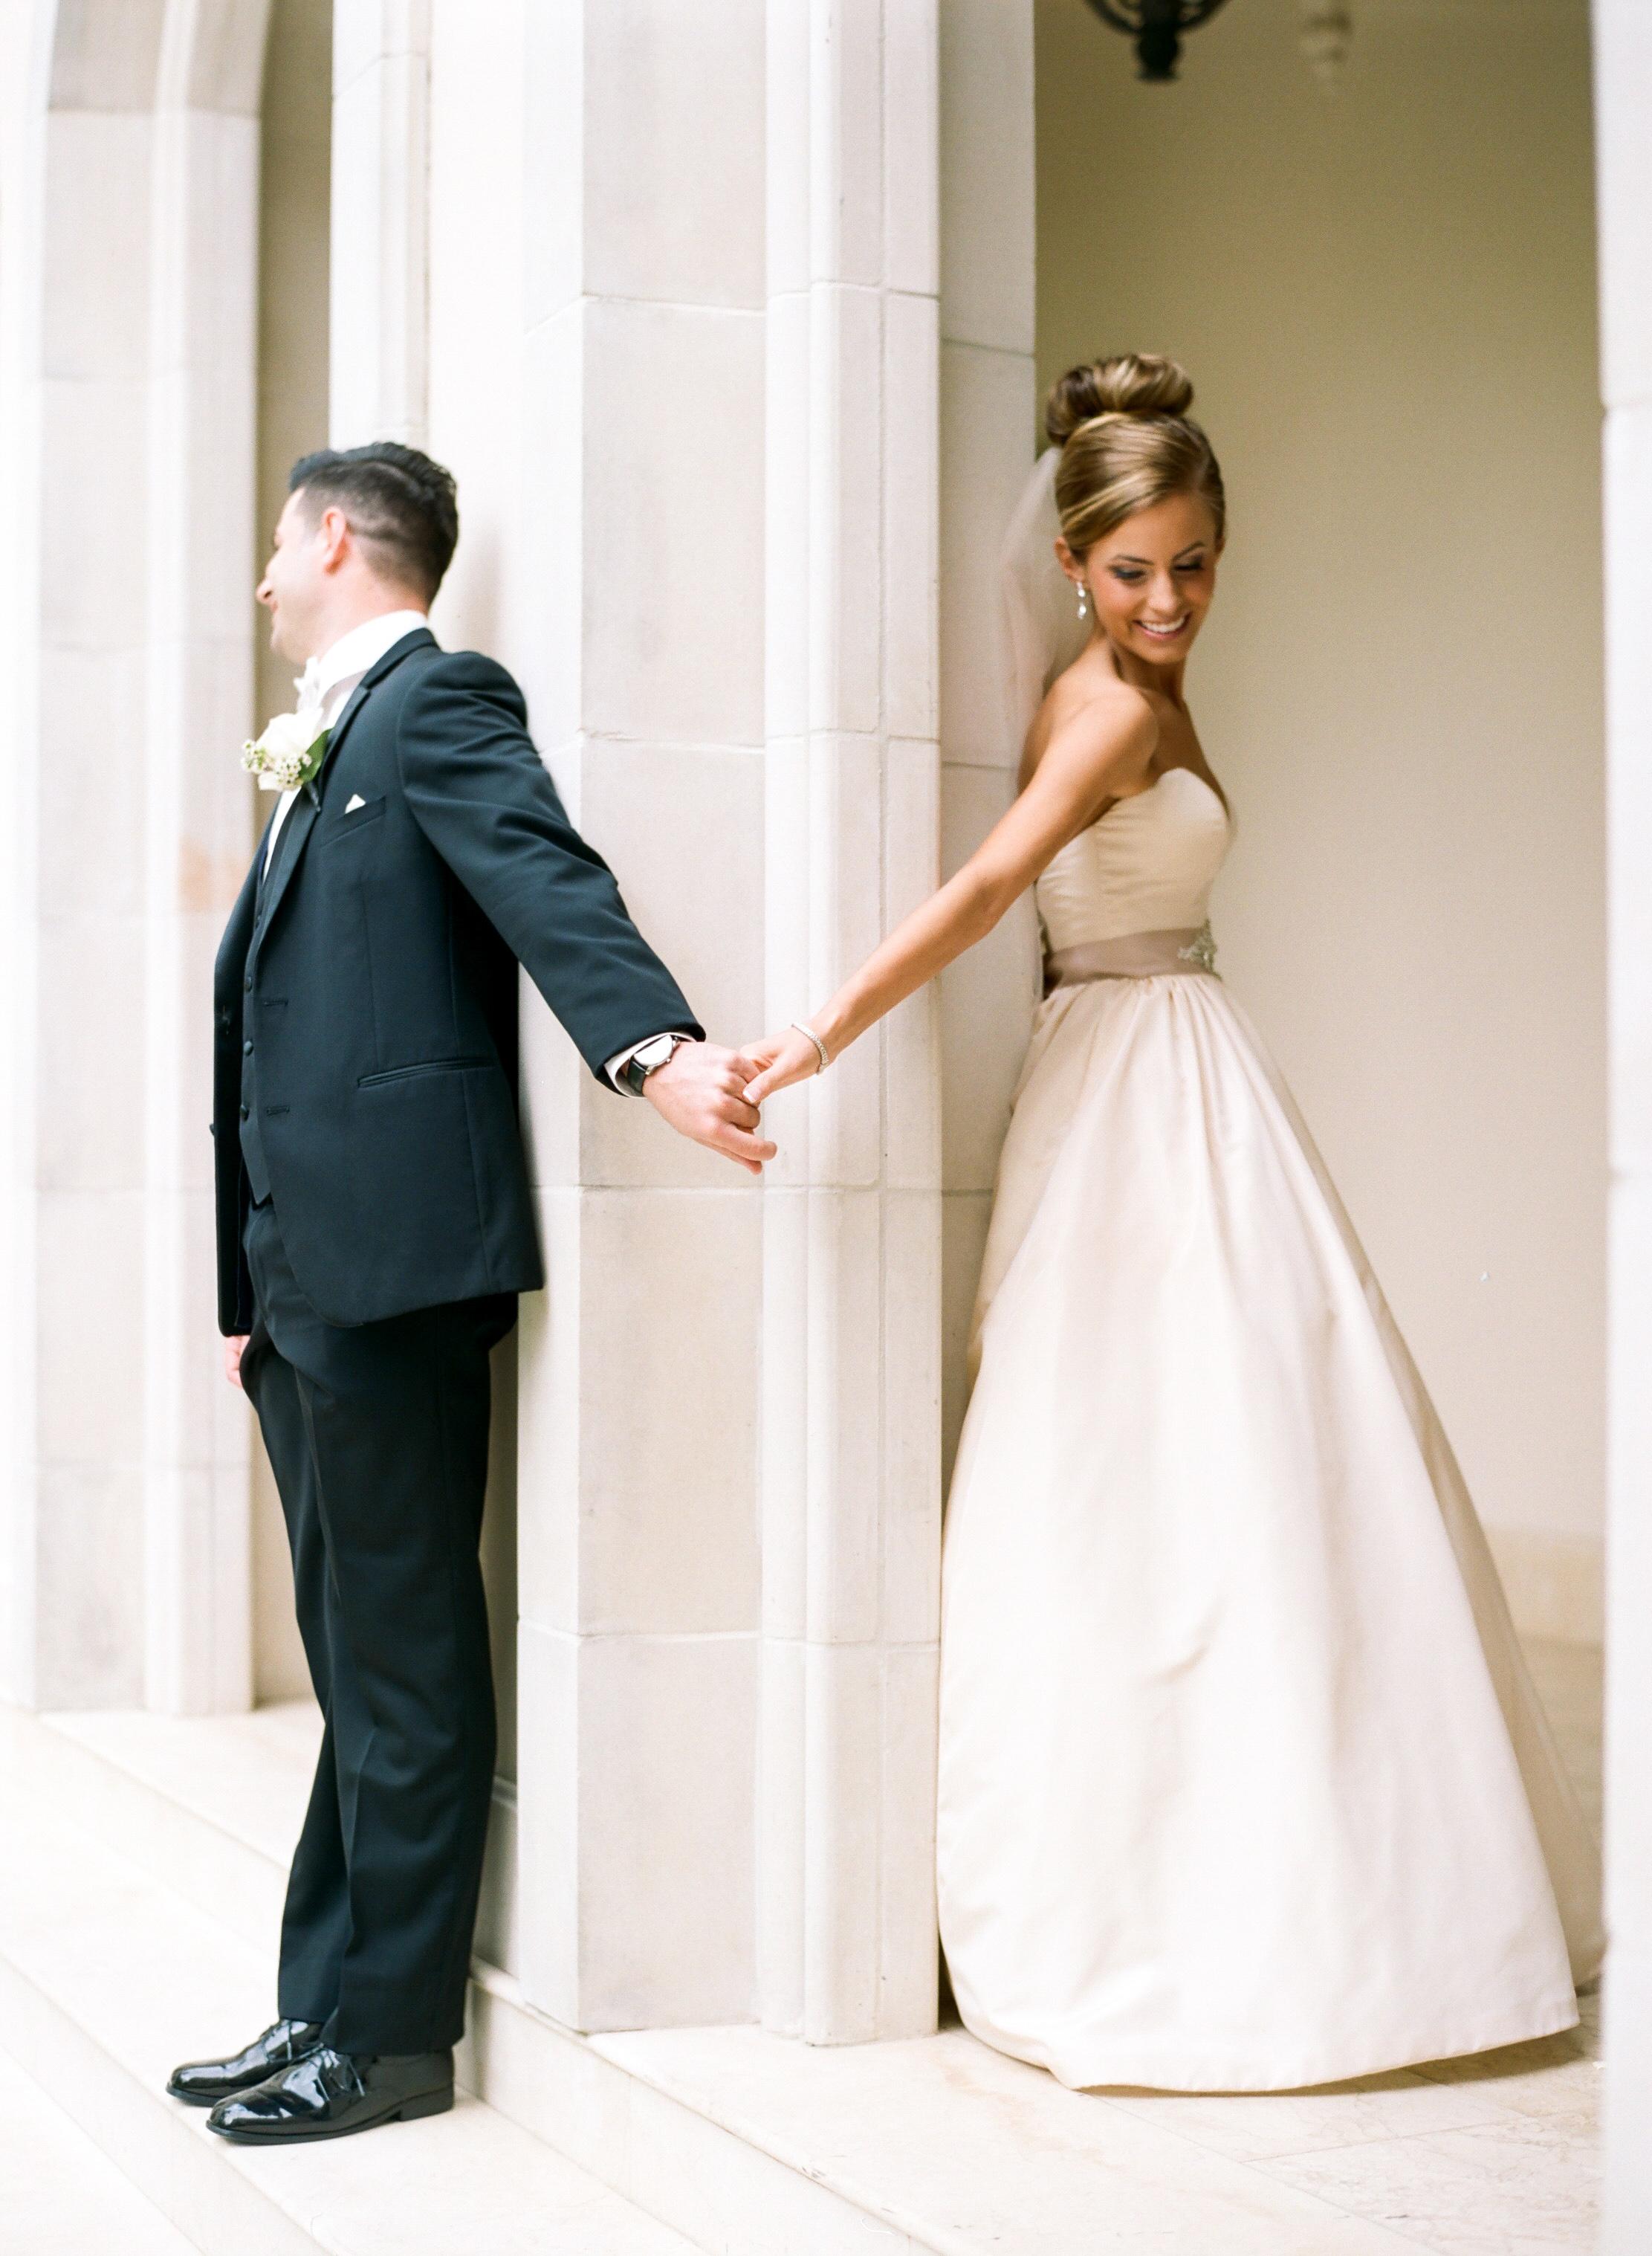 Dana-Fernandez-Photography-Houston-Wedding-Photographer-Style-Me-Pretty-Film-Texas-Destination-Photographer-19.jpg